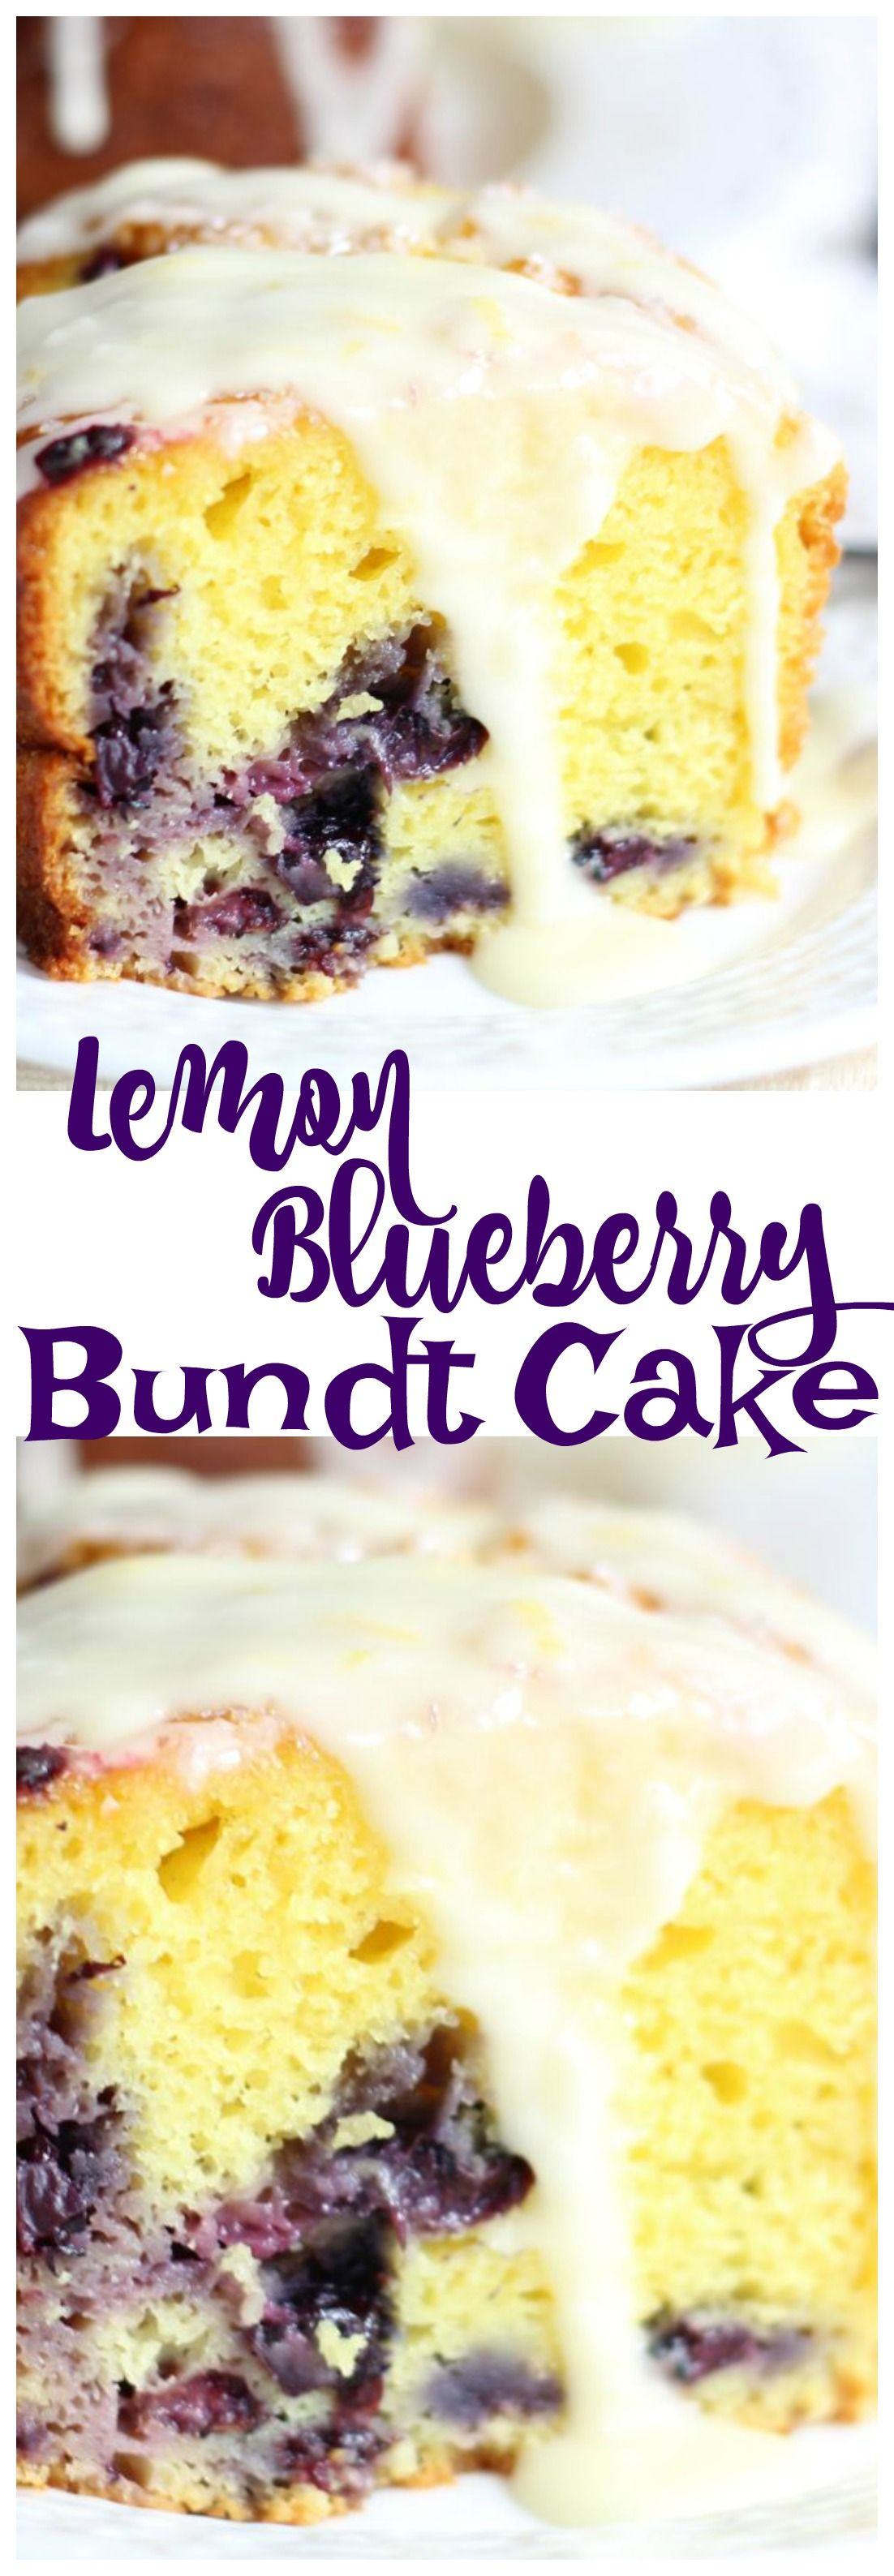 Lemon Blueberry Bundt Cake pin 2